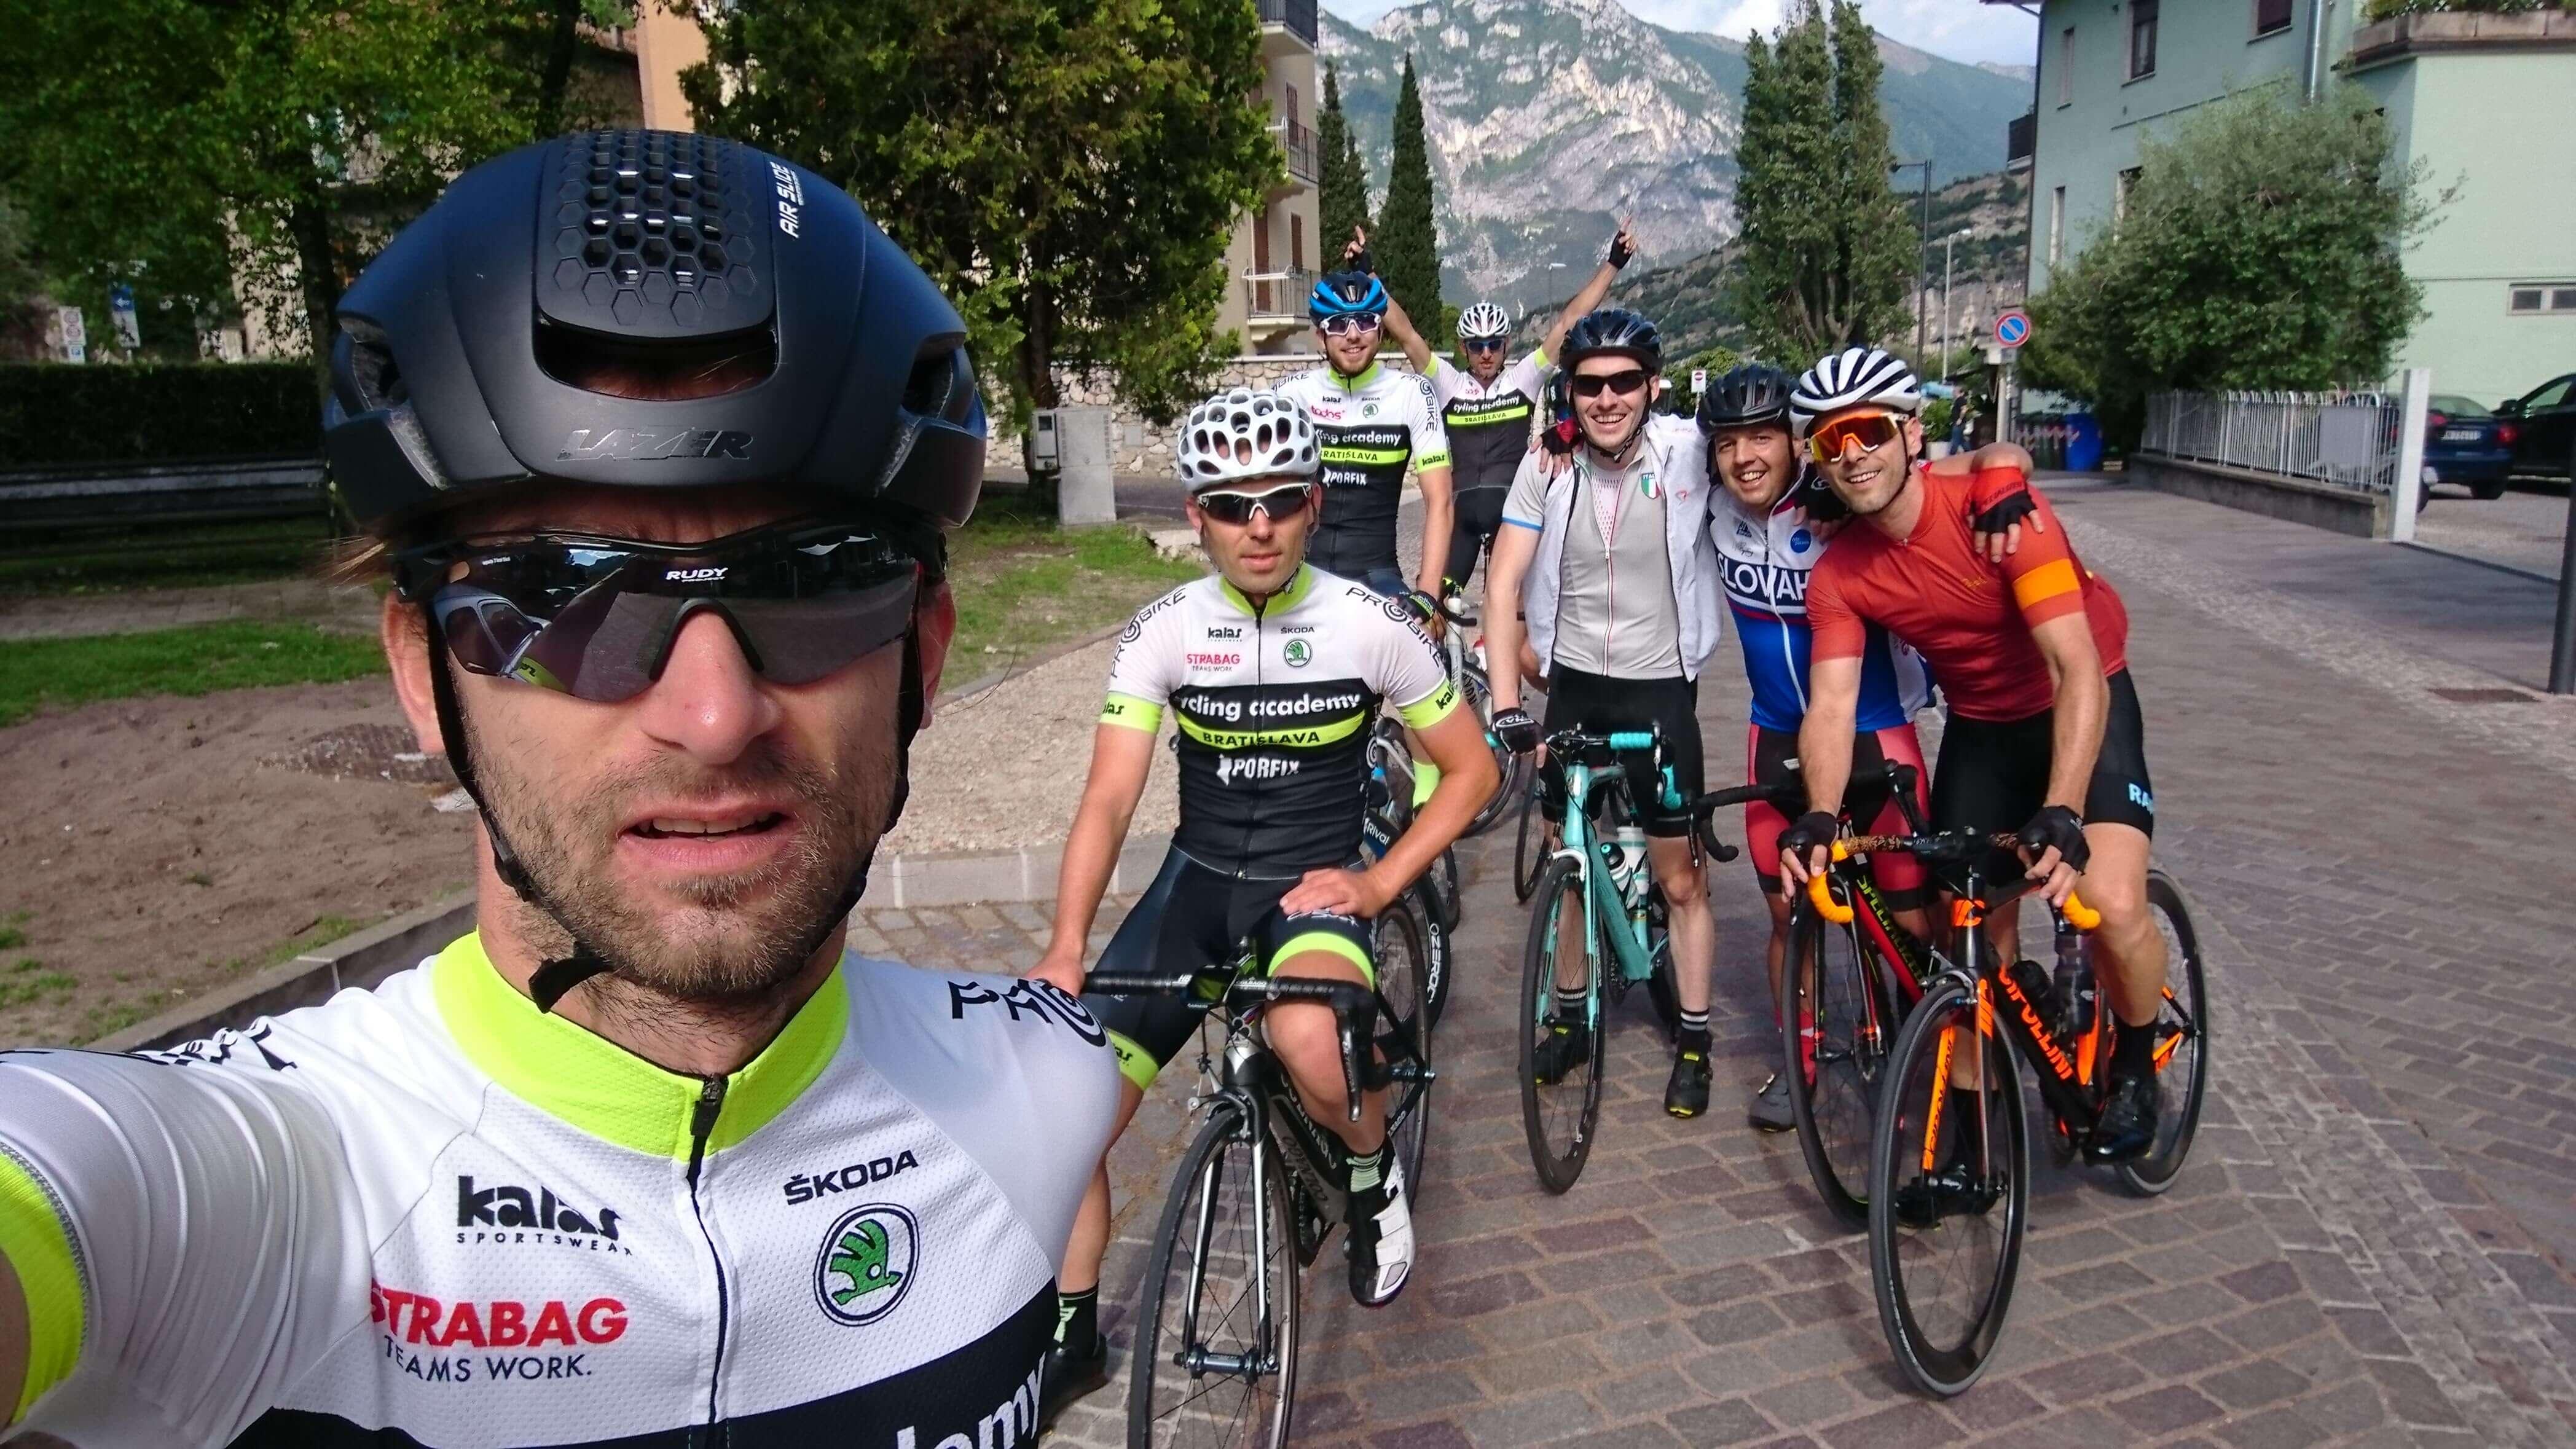 cyklisticky kemp sustredenie cyklosvet